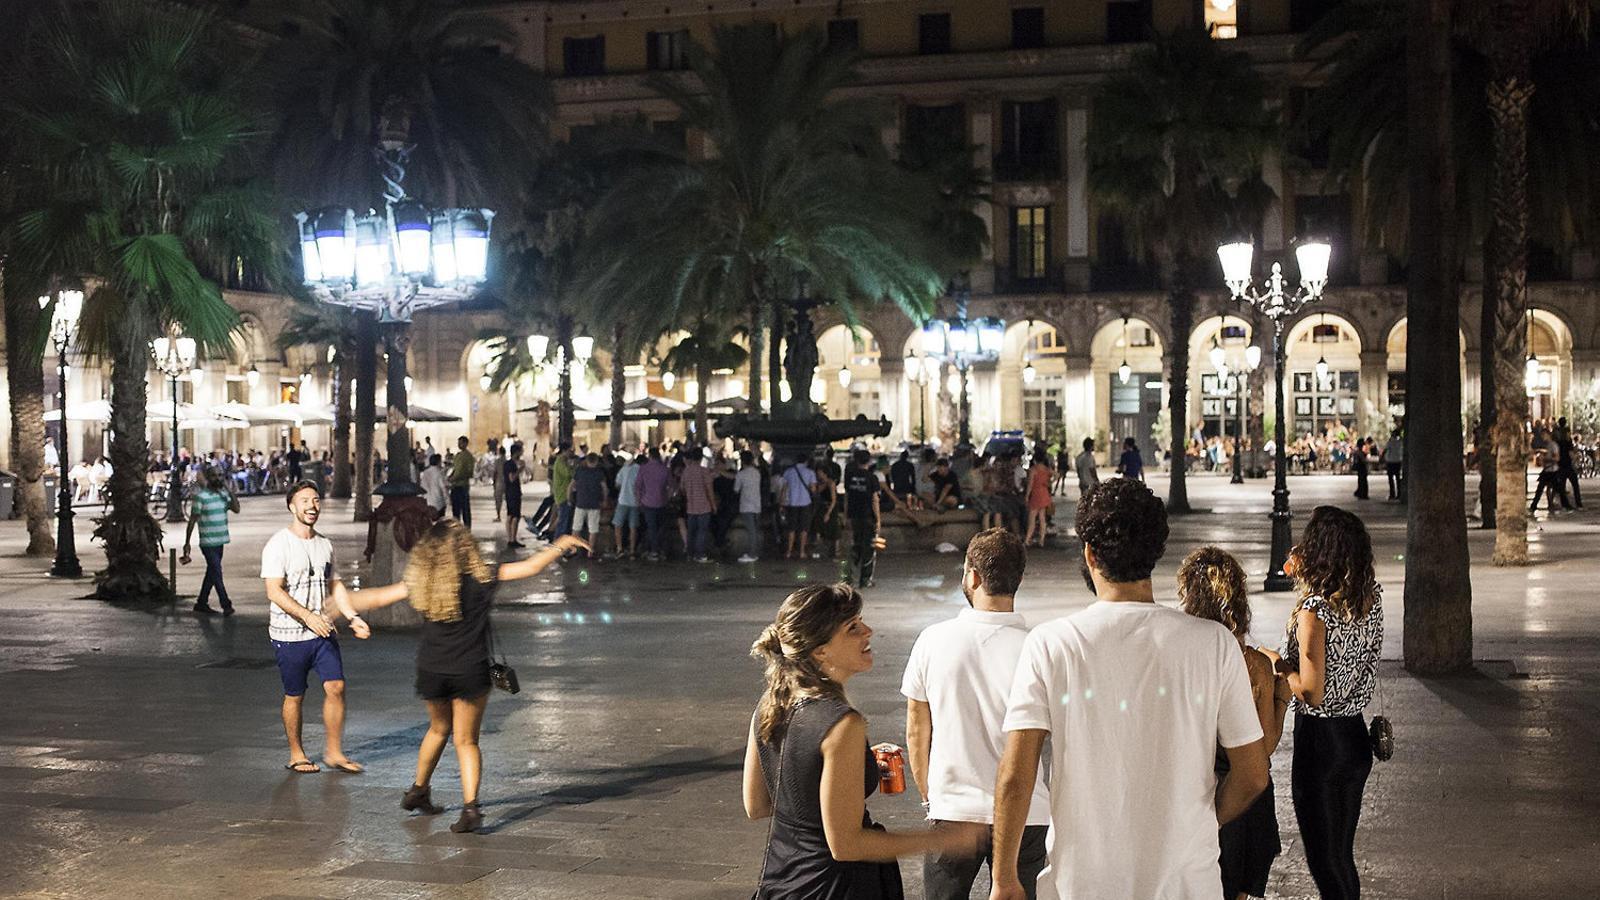 Setge a l'oci nocturn i a l'oferta turística  a Ciutat Vella